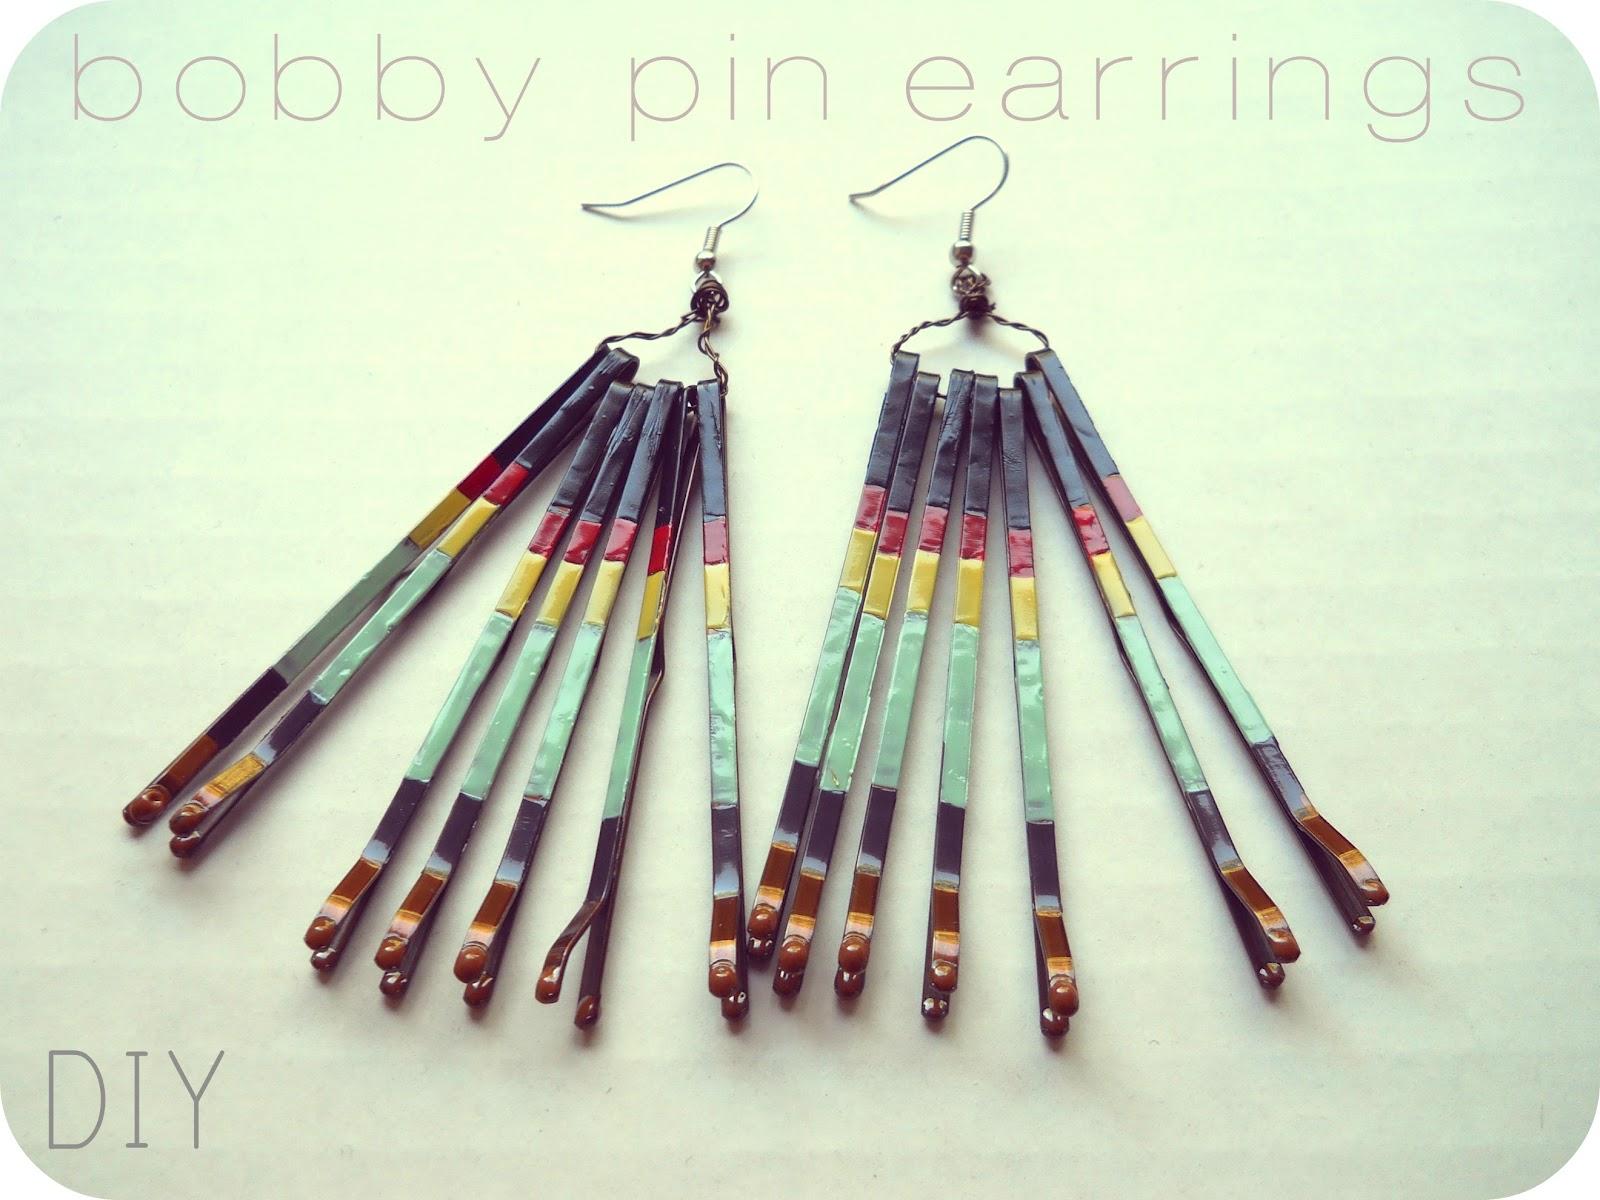 The metric child diy bobby pin earrings